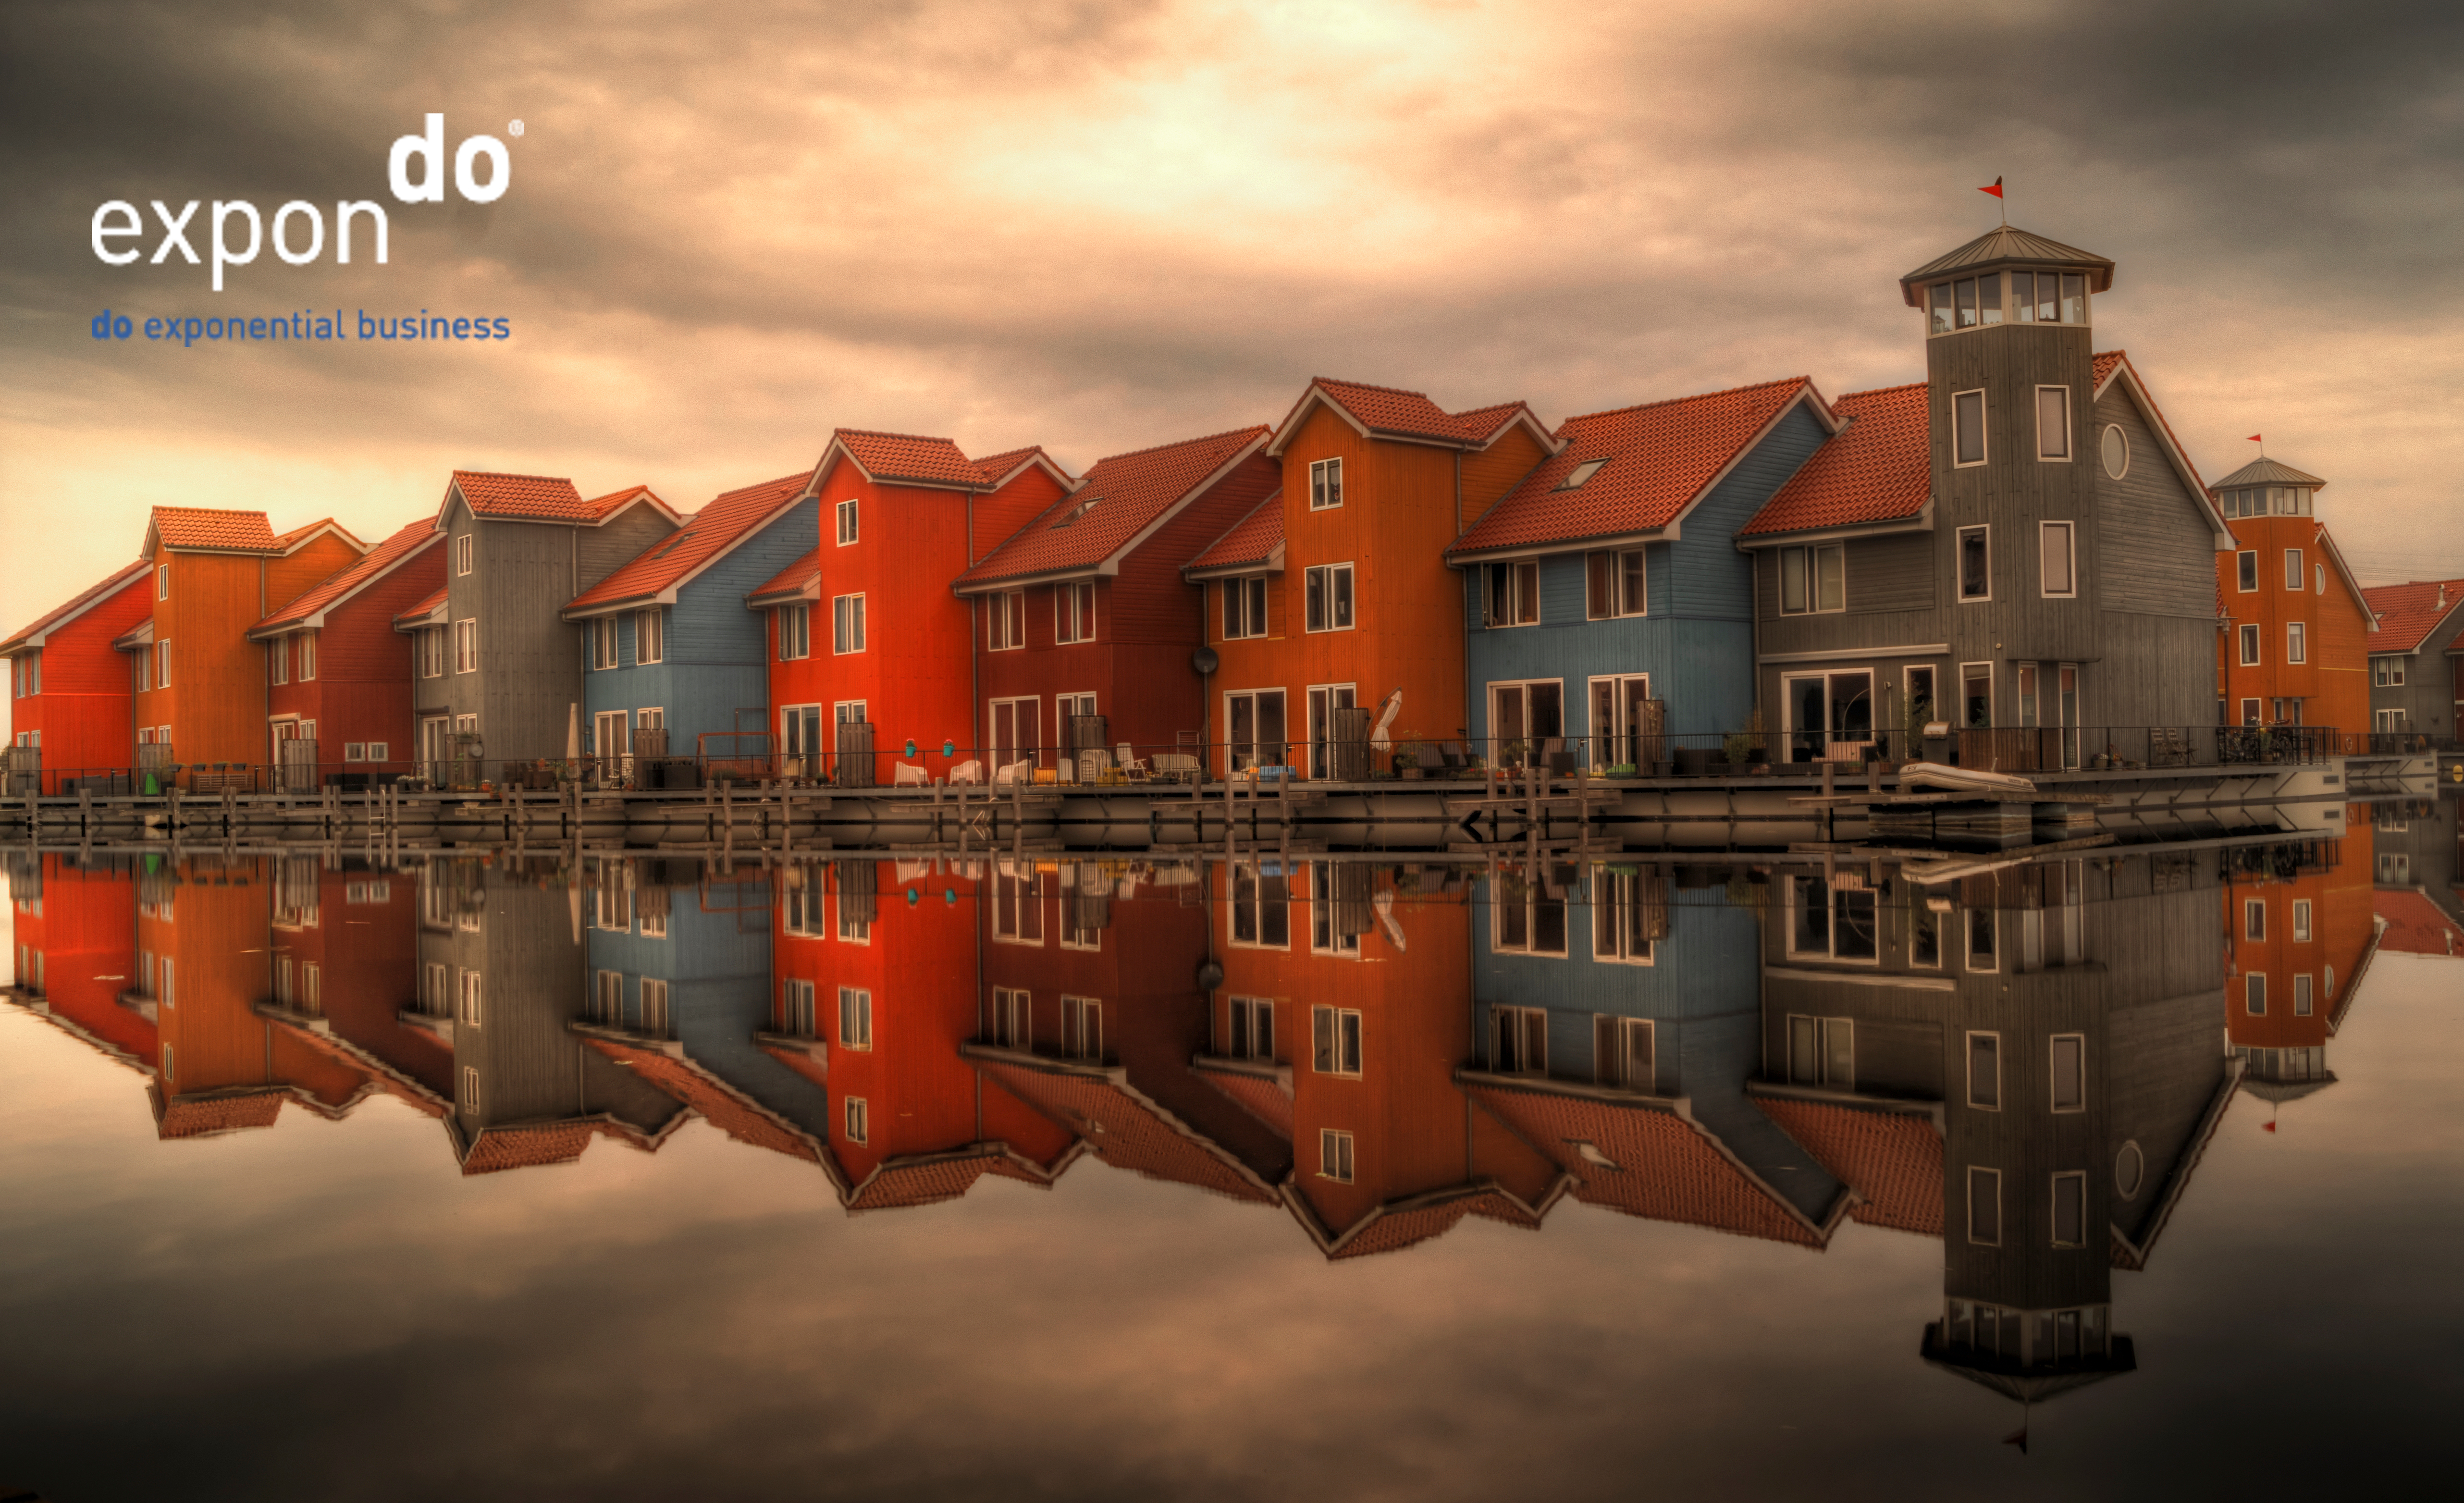 expondo Expansion in die Niederlande